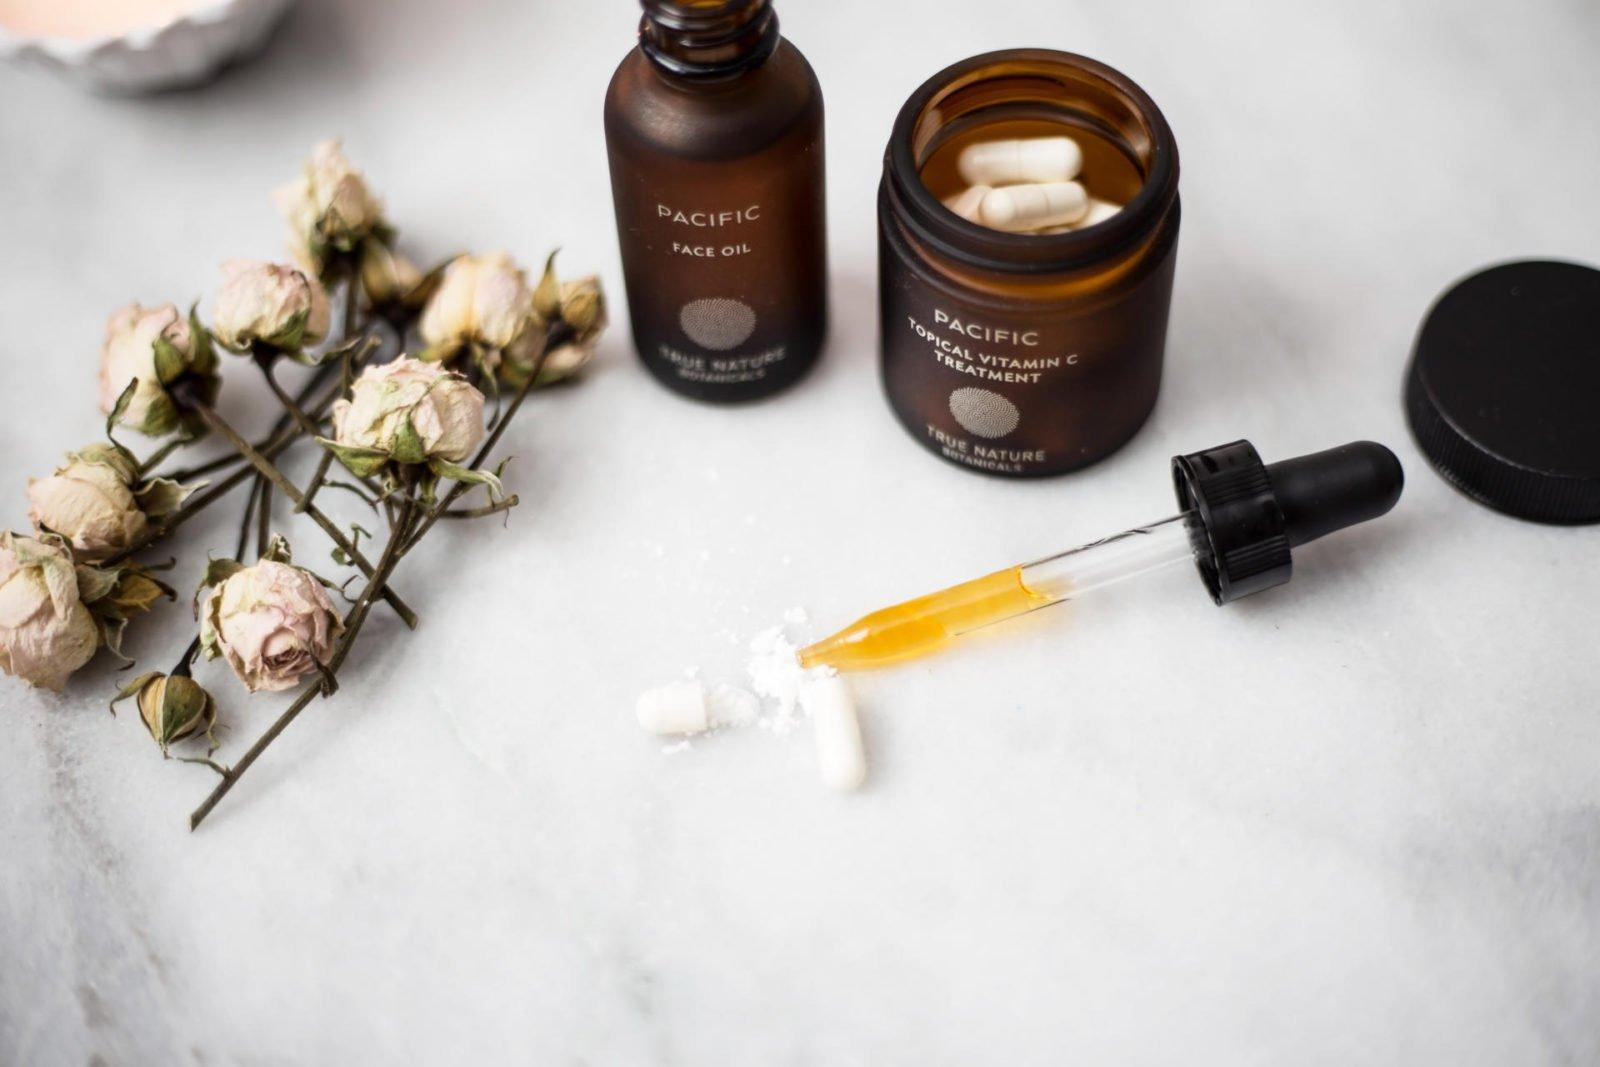 true botanics facial oil Topical vitamin c treatment natural skincare